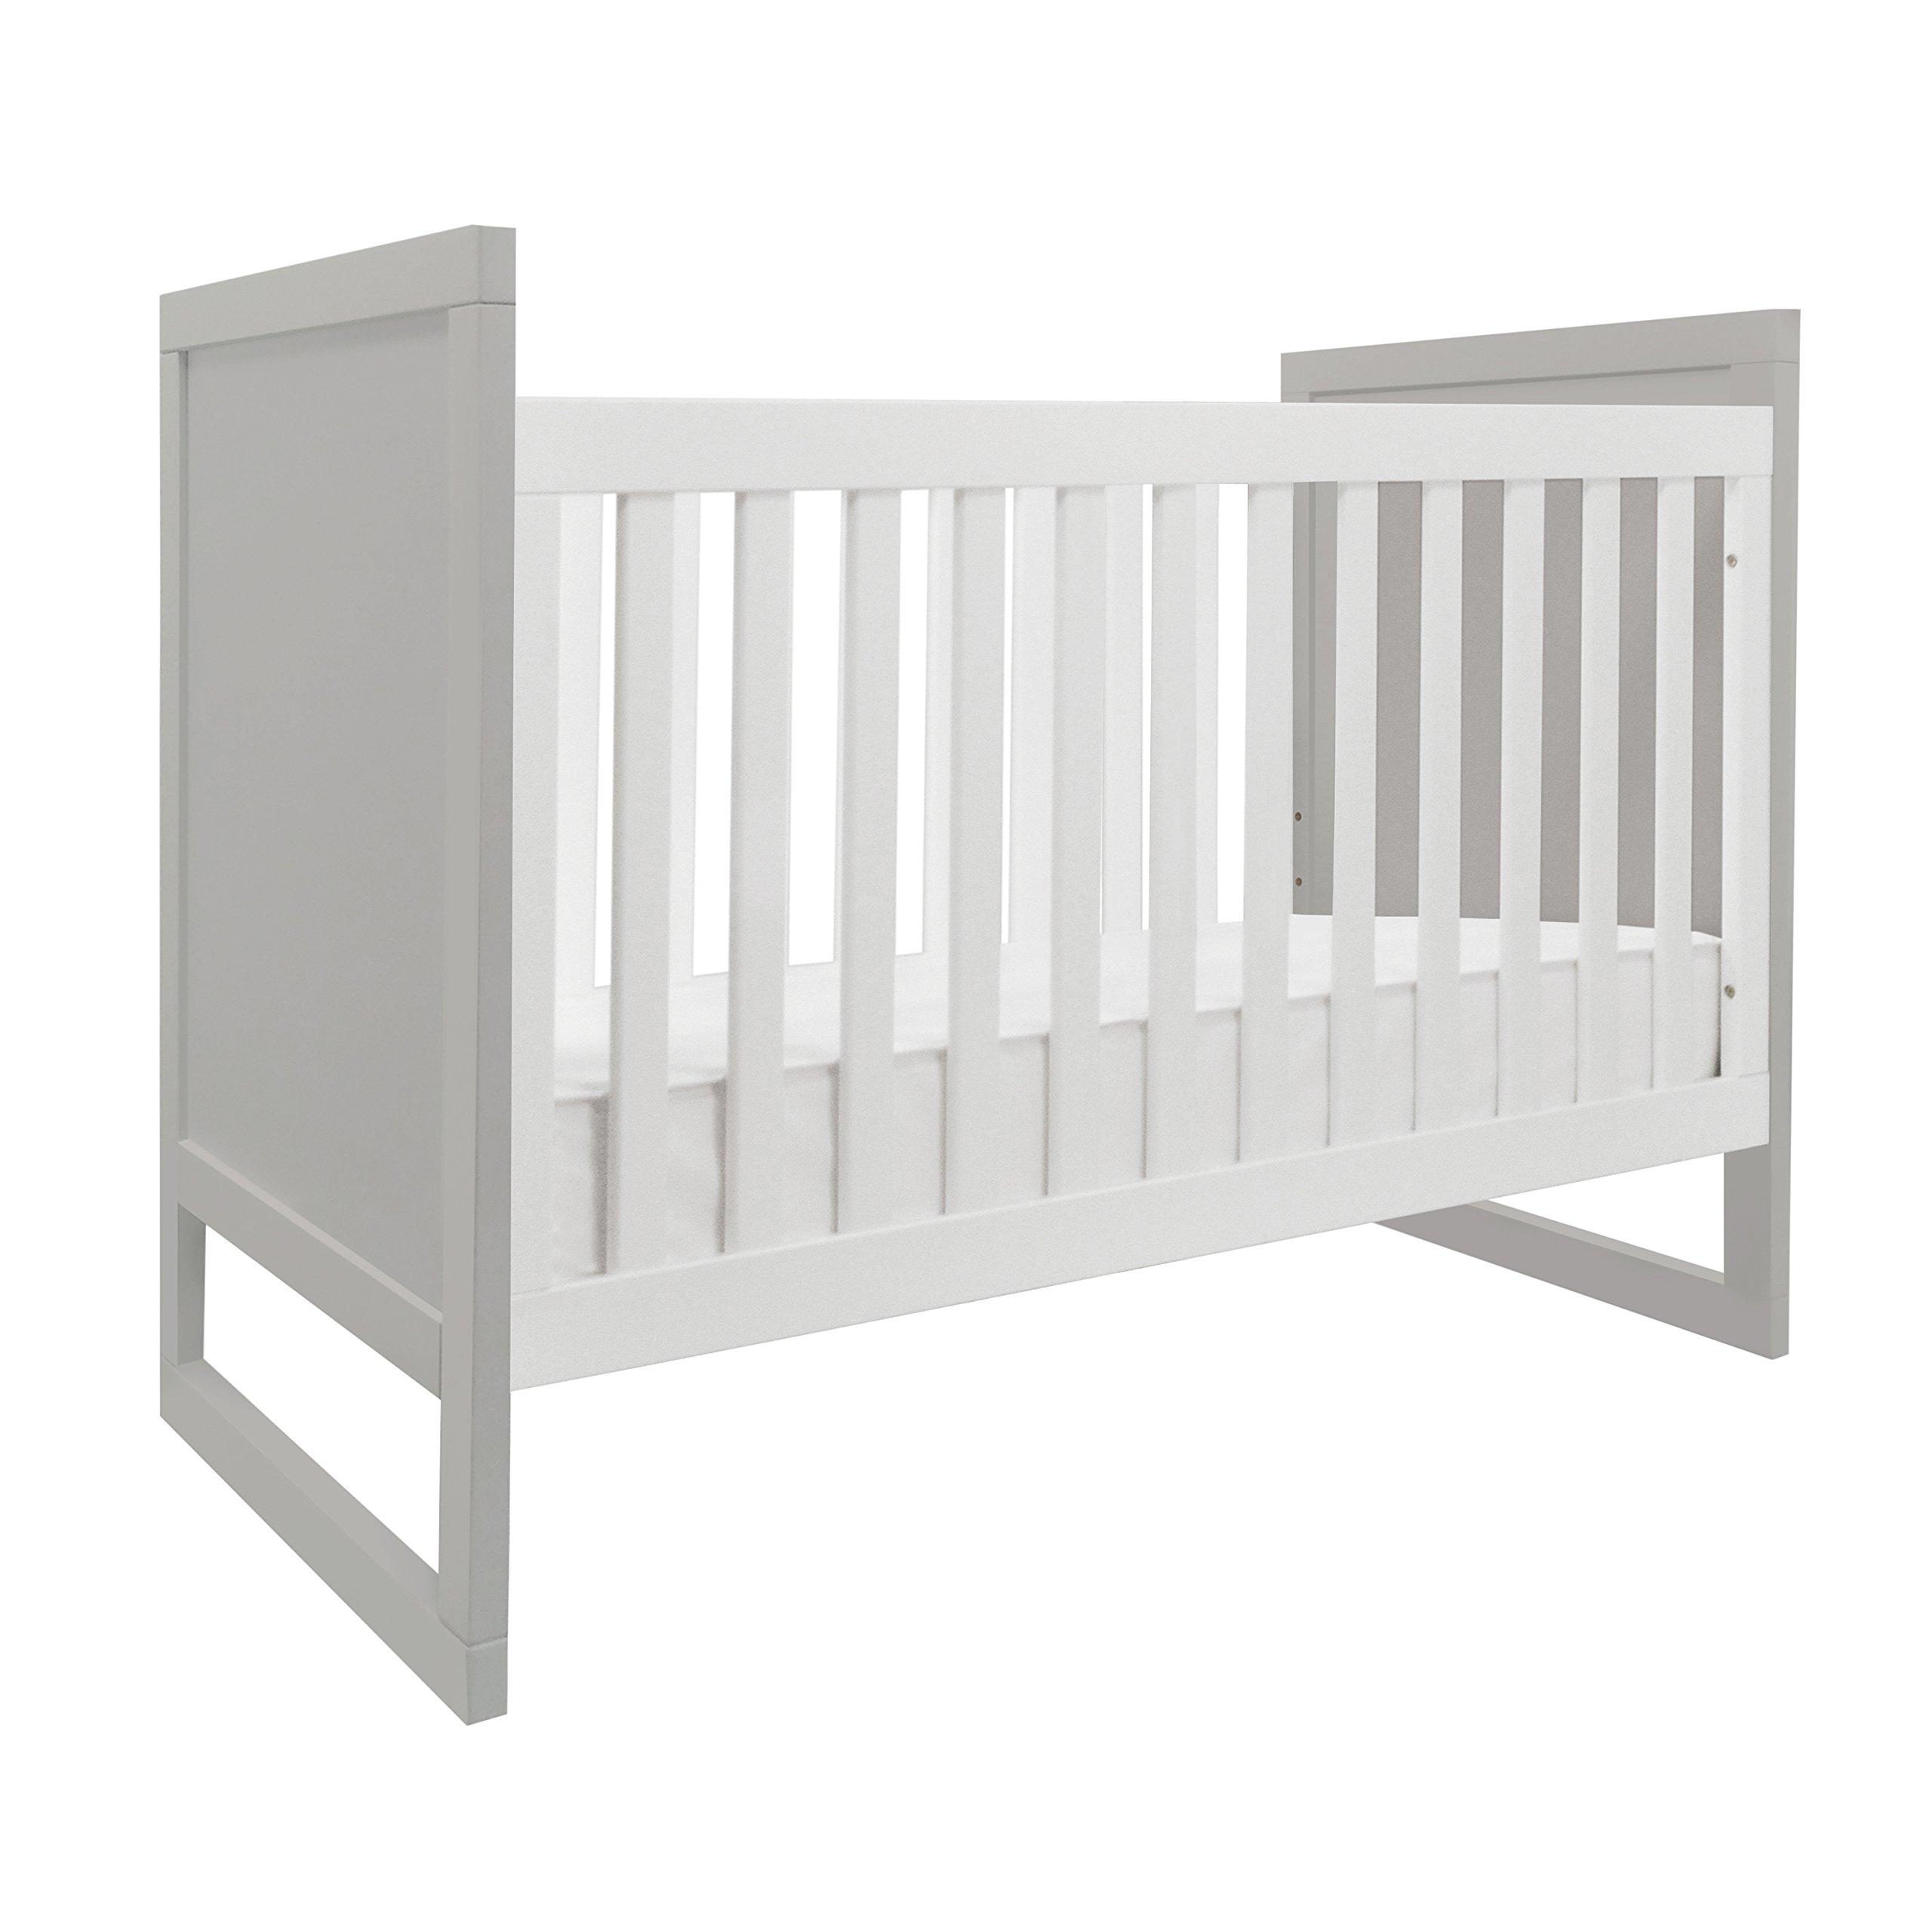 Baby Mod Modena Mod Two Tone 3-in-1 Convertible Crib, Grey/White